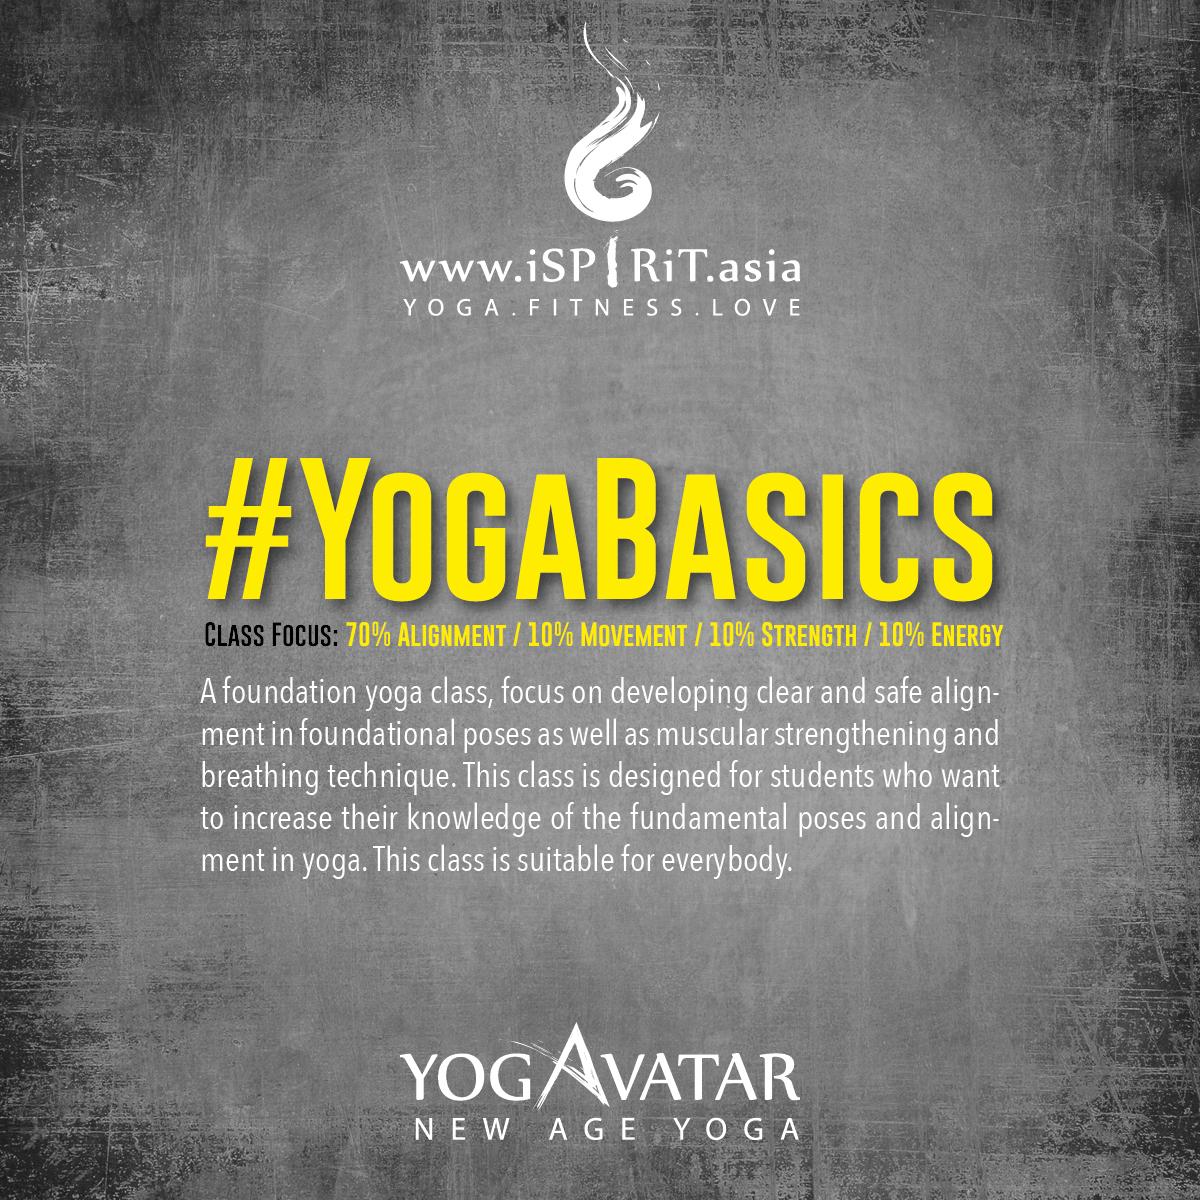 #YogaBasics